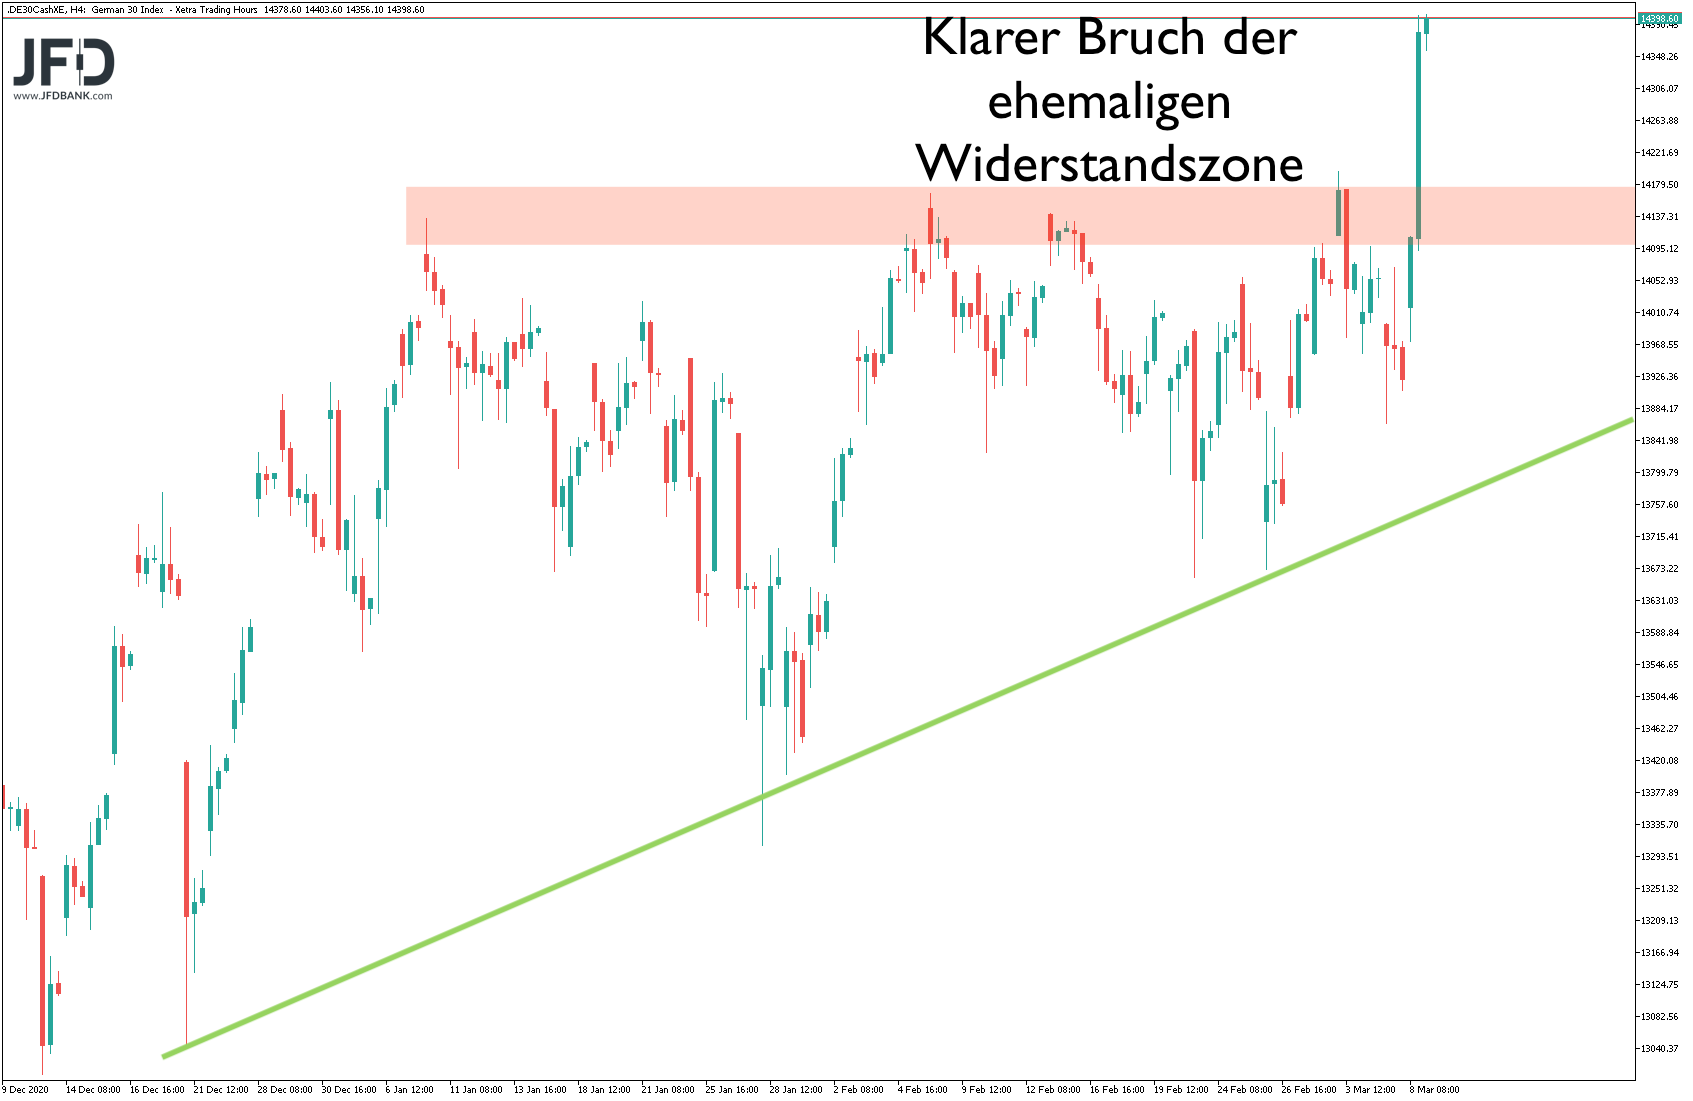 DAX-Rekordhoch-erzielt-halten-wir-das-Niveau-Kommentar-JFD-Bank-GodmodeTrader.de-5